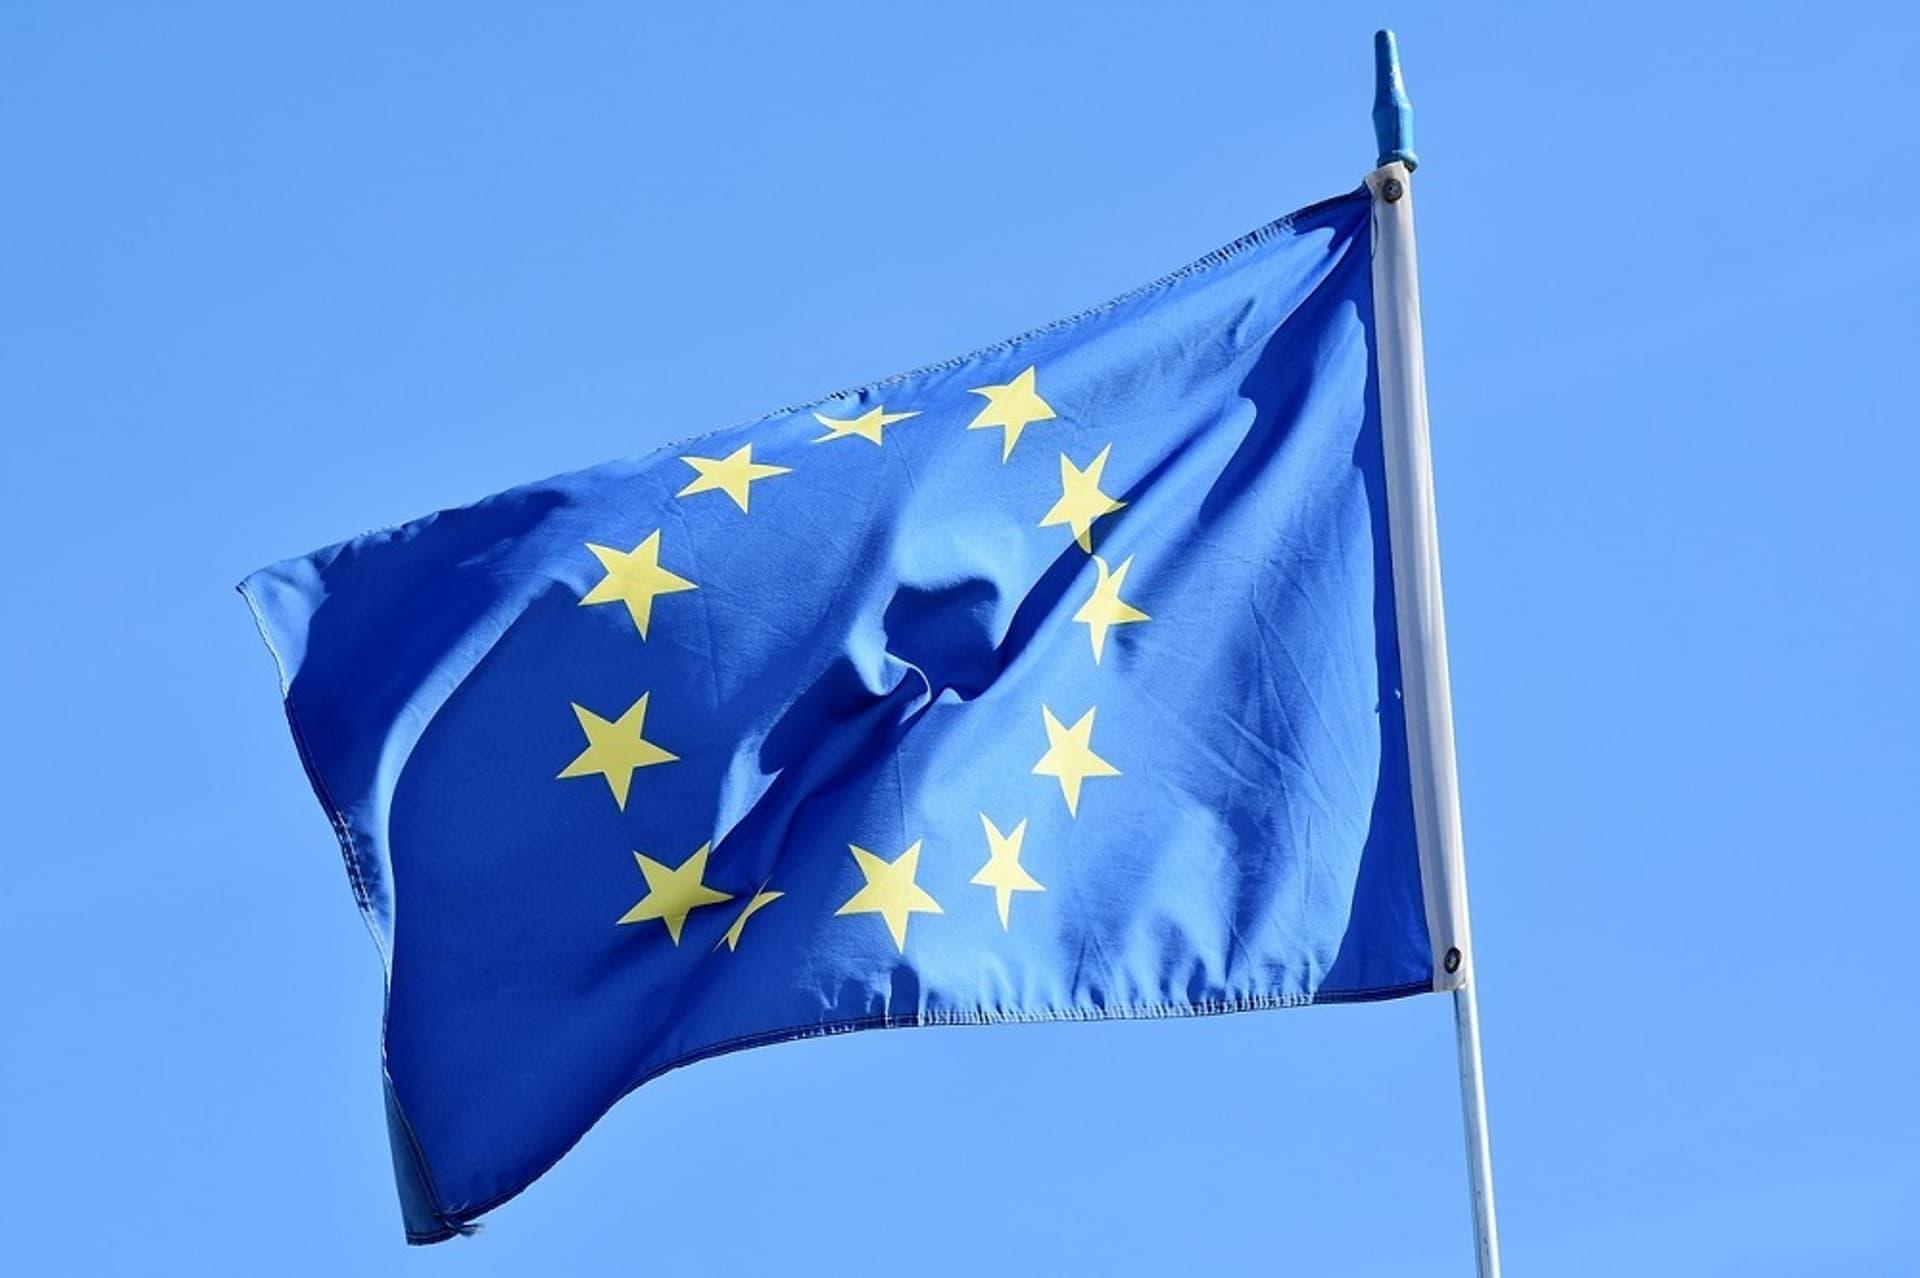 EU Flagge c Pixabay Capri23auto